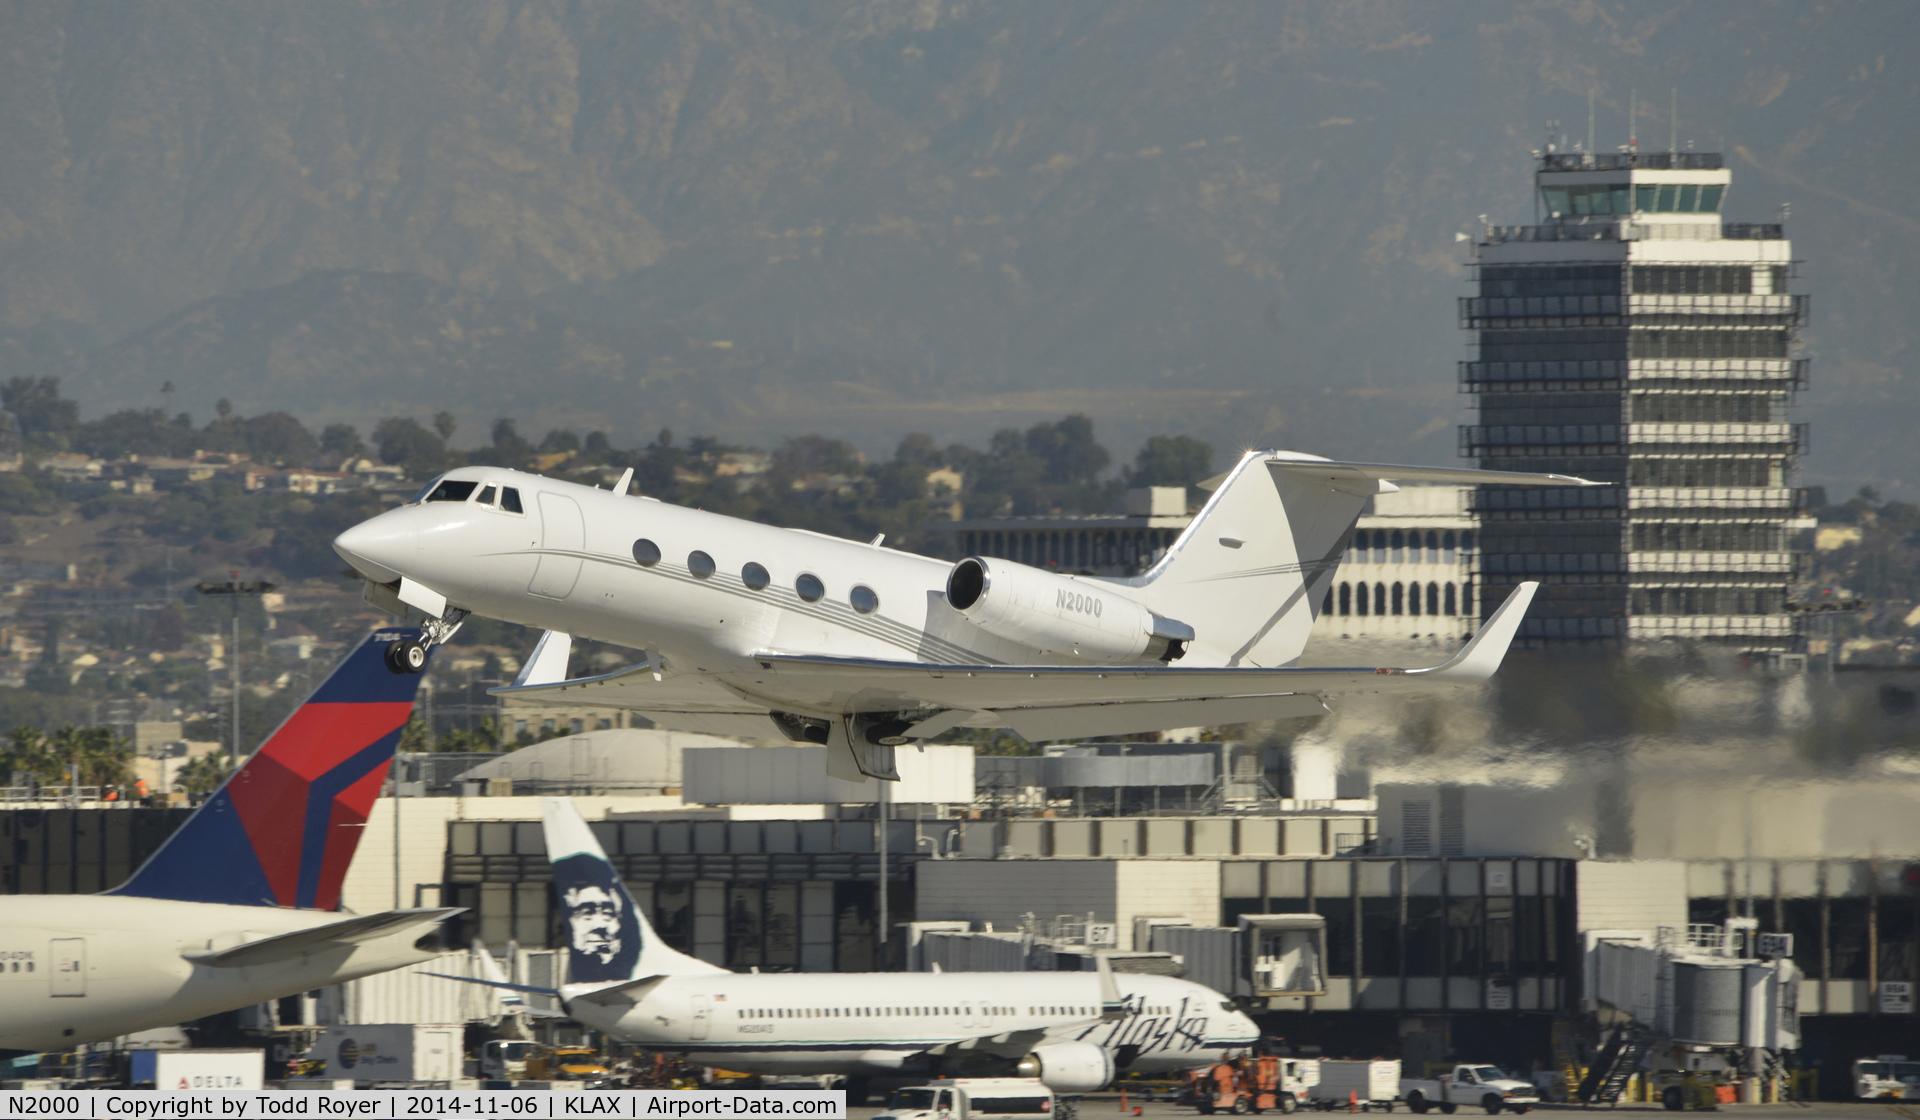 N2000, 1969 Grumman G-1159 C/N 56, Departing LAX on 25L